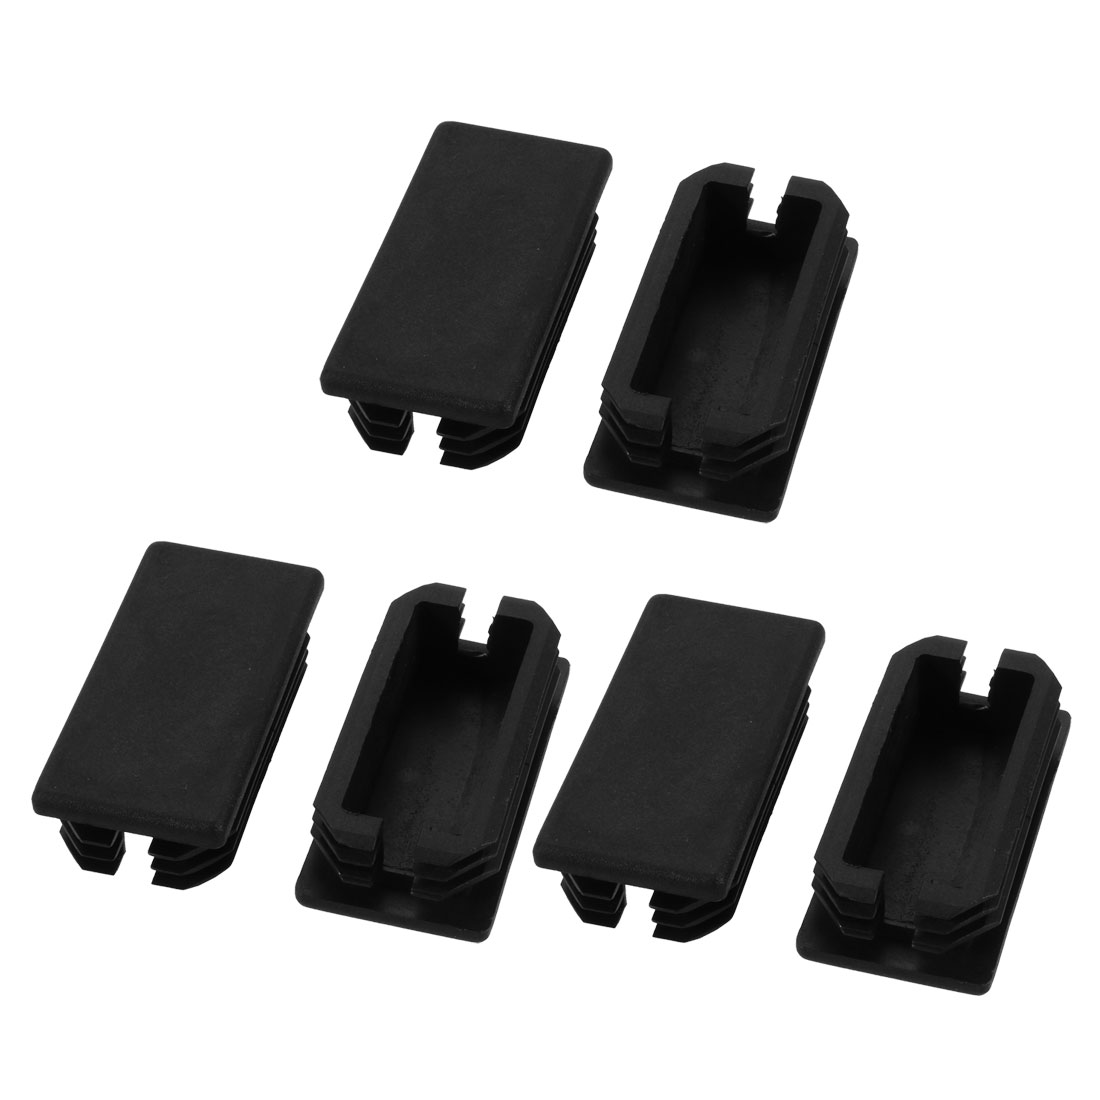 6pcs Furniture Legs Protector Rectangular Tube Inserts Cap Black 60mm x 30mm